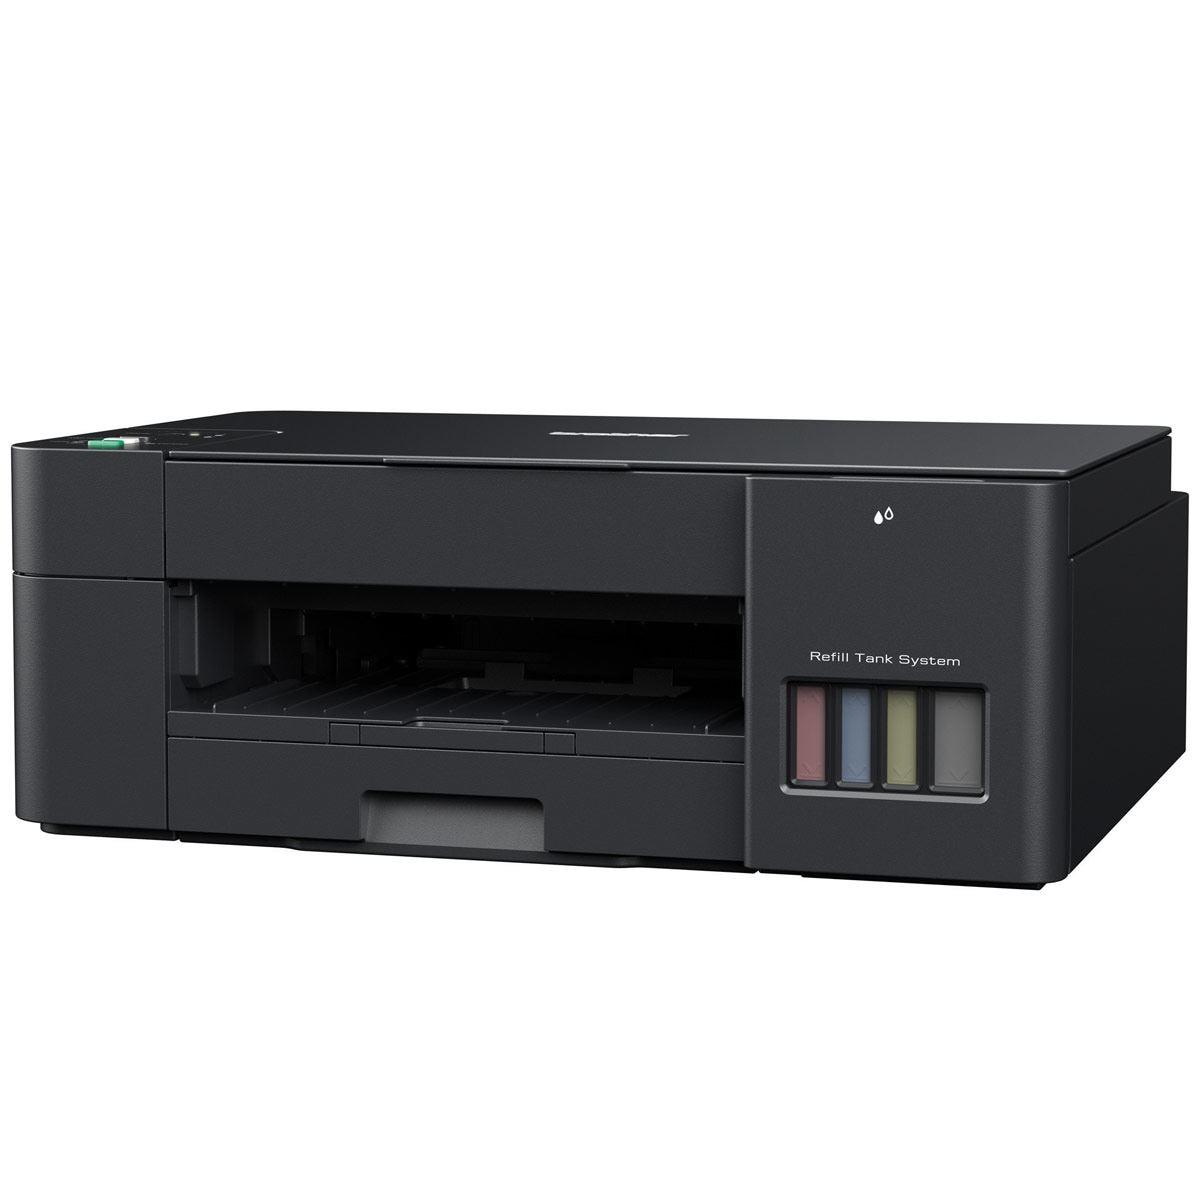 Impresora Multifuncional Brother Ink Tank DCP-T220